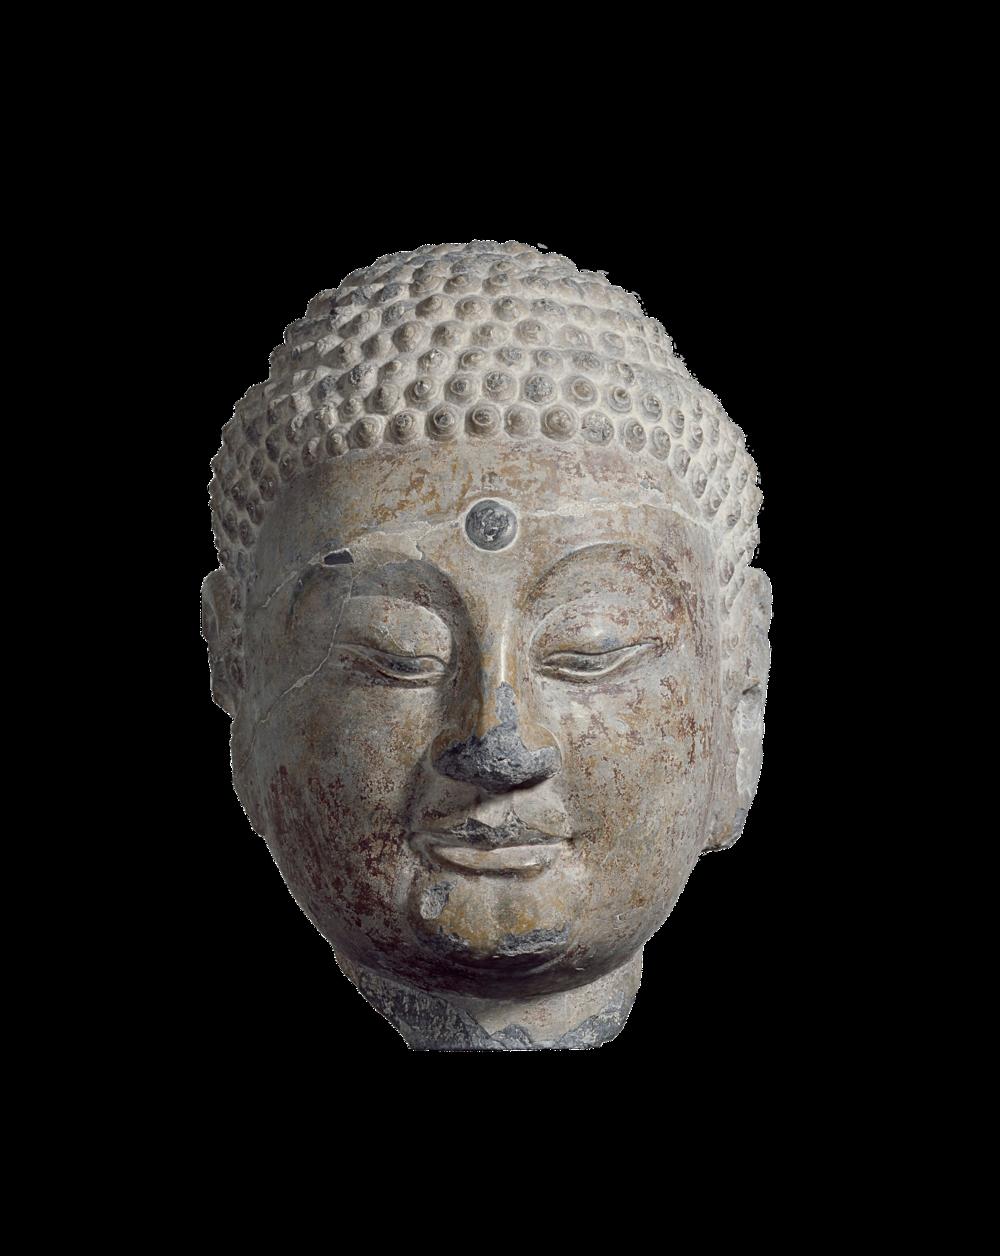 Kopf eines Buddhas